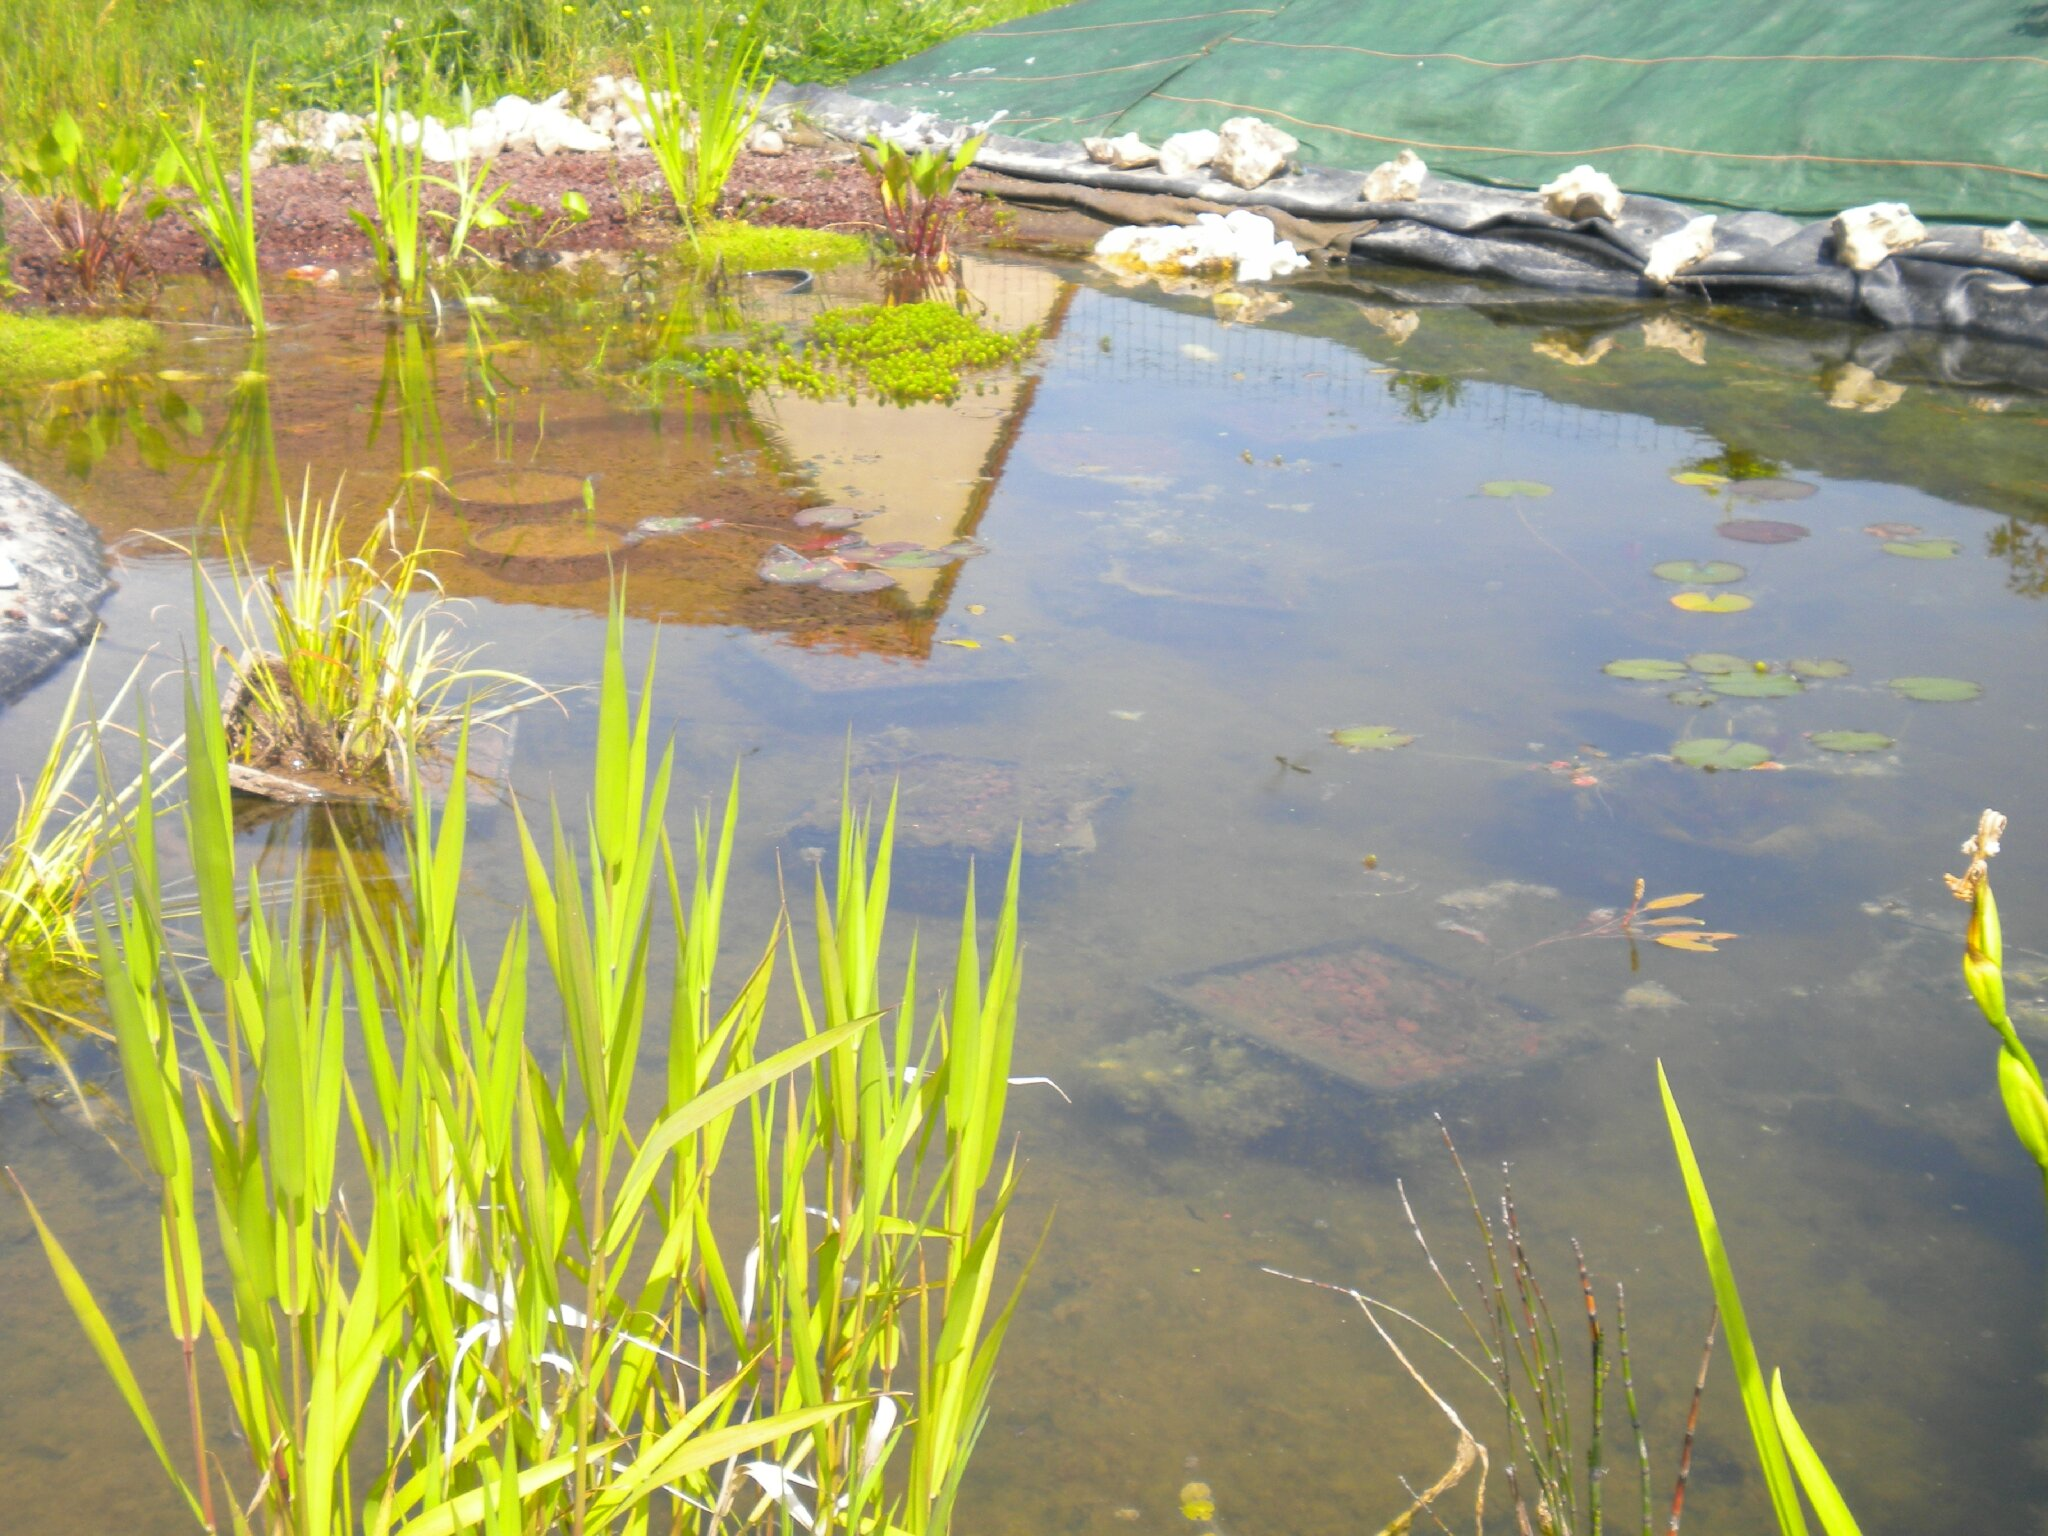 Le bassin juin 2013 notre jardin ecologique for Toile bassin